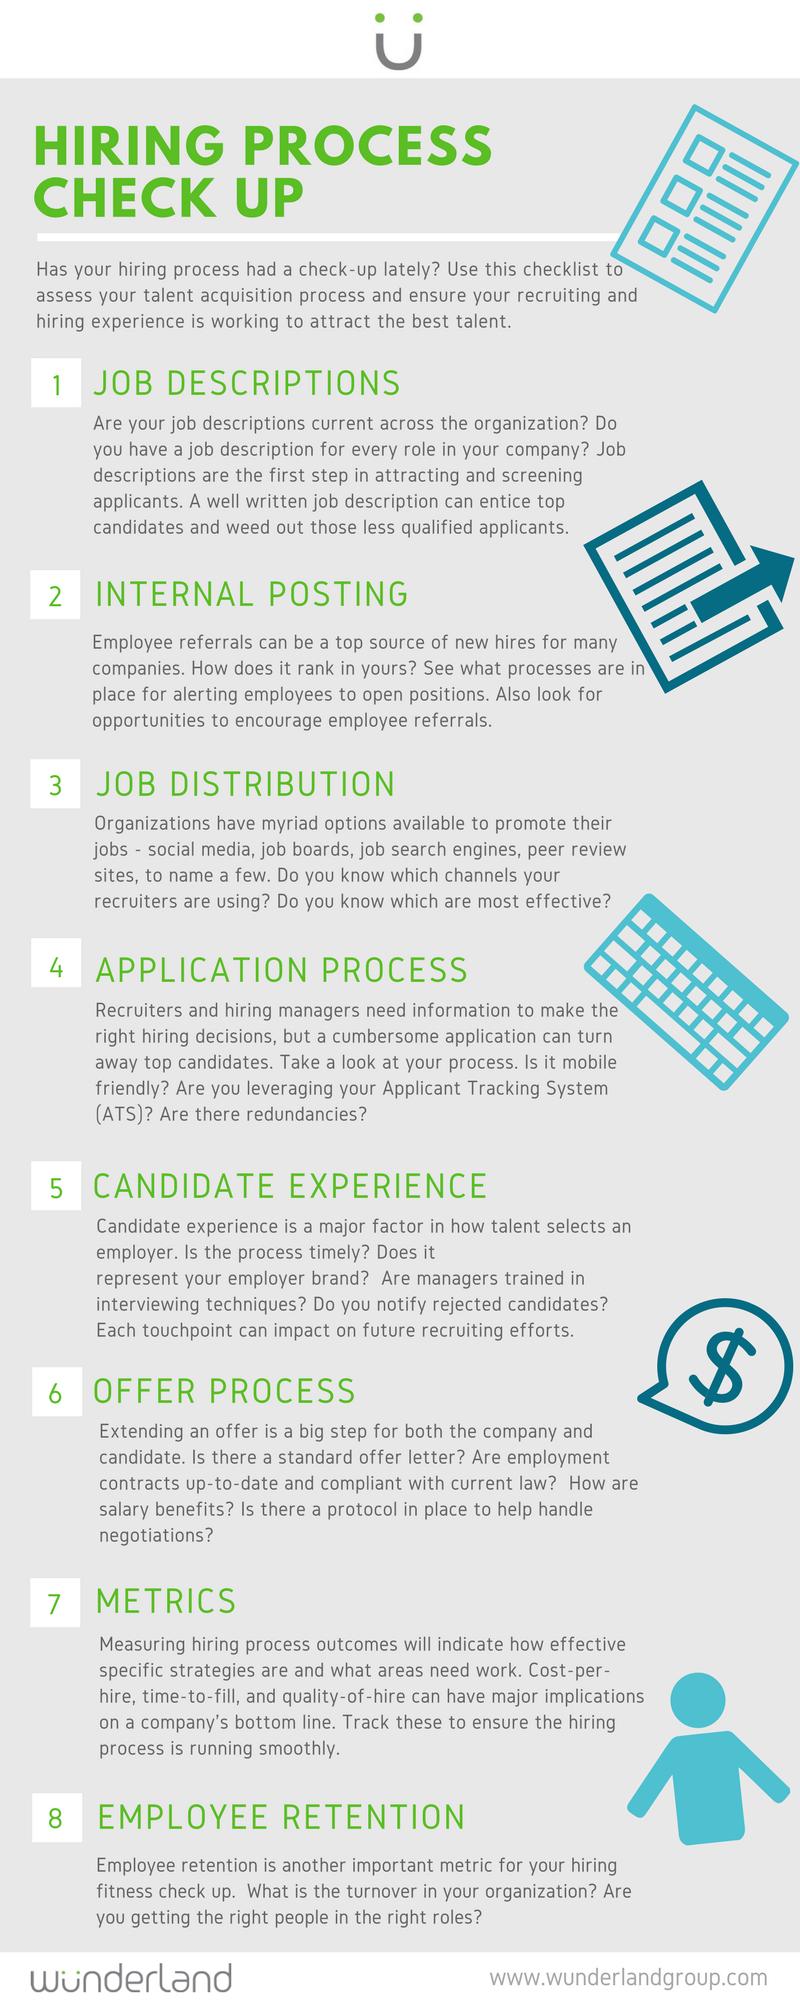 Hiring Process Check Up | WunderLand Group | Digital, Marketing, and CreativeTalent